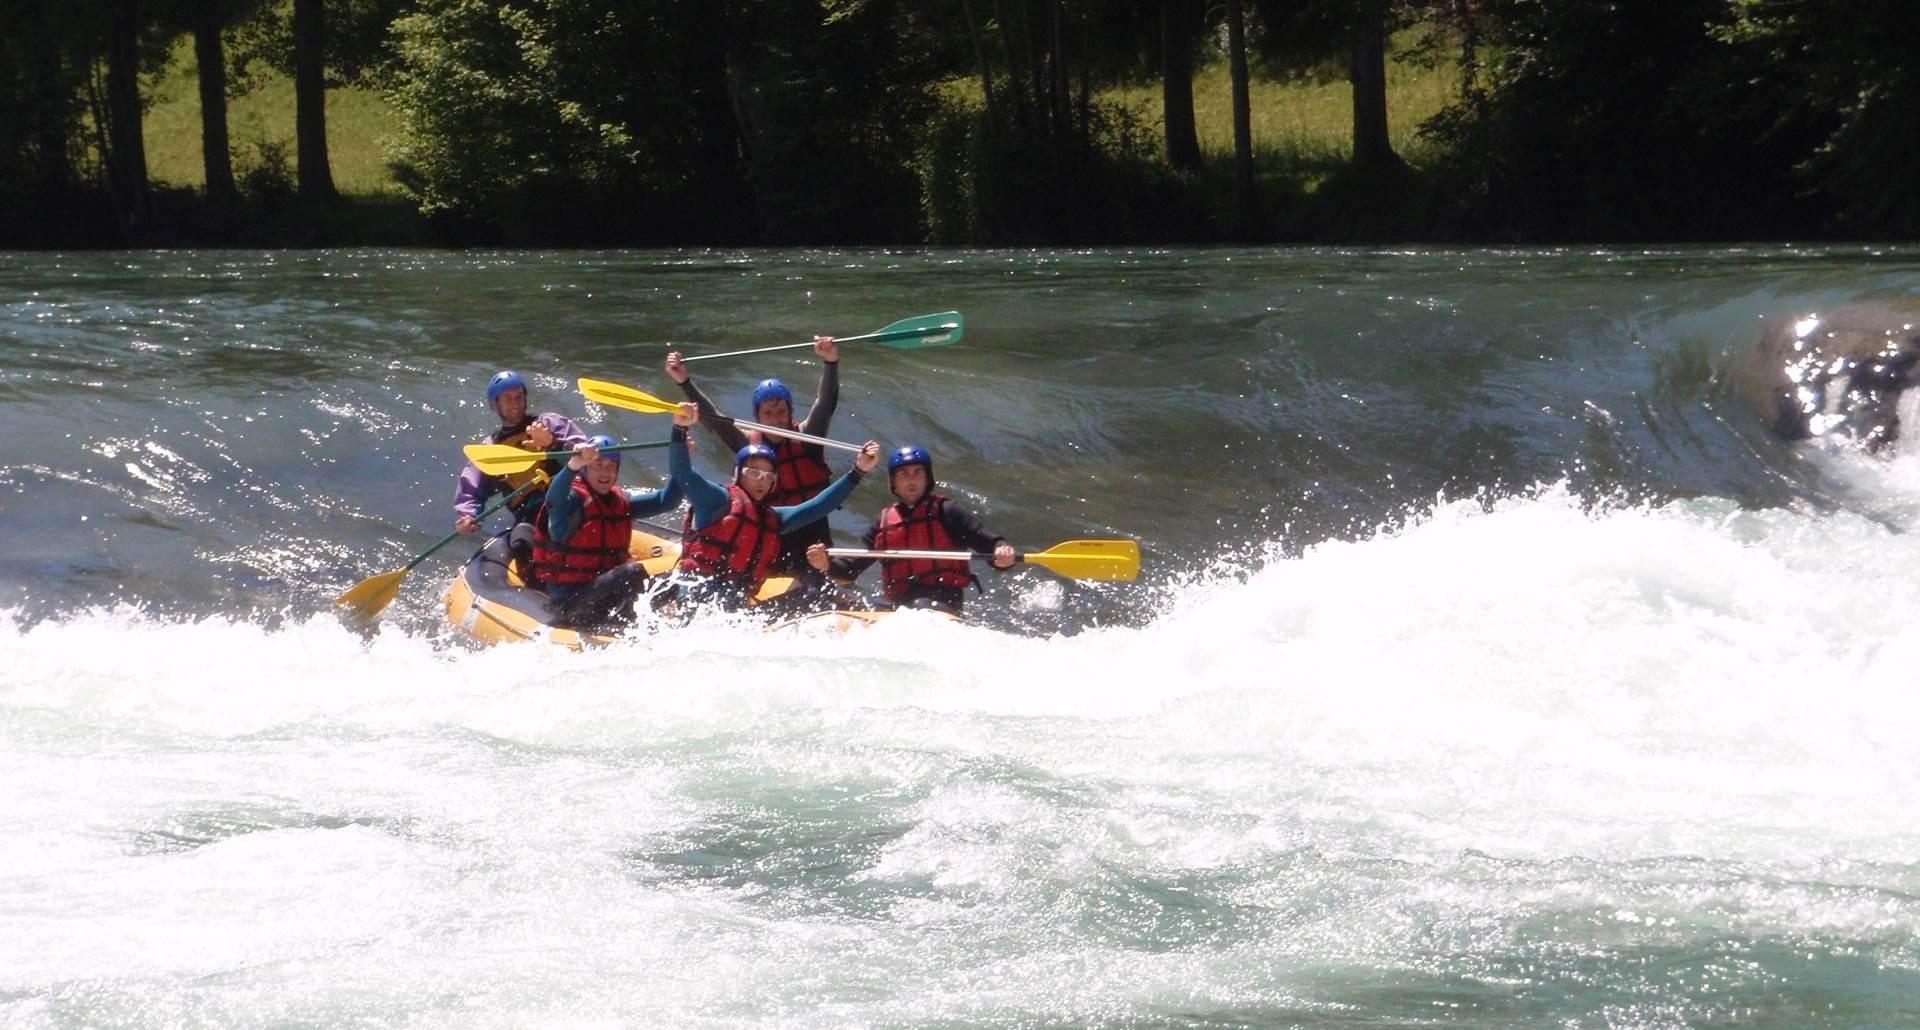 rafting raft evasieau montaut Lestelle betharram